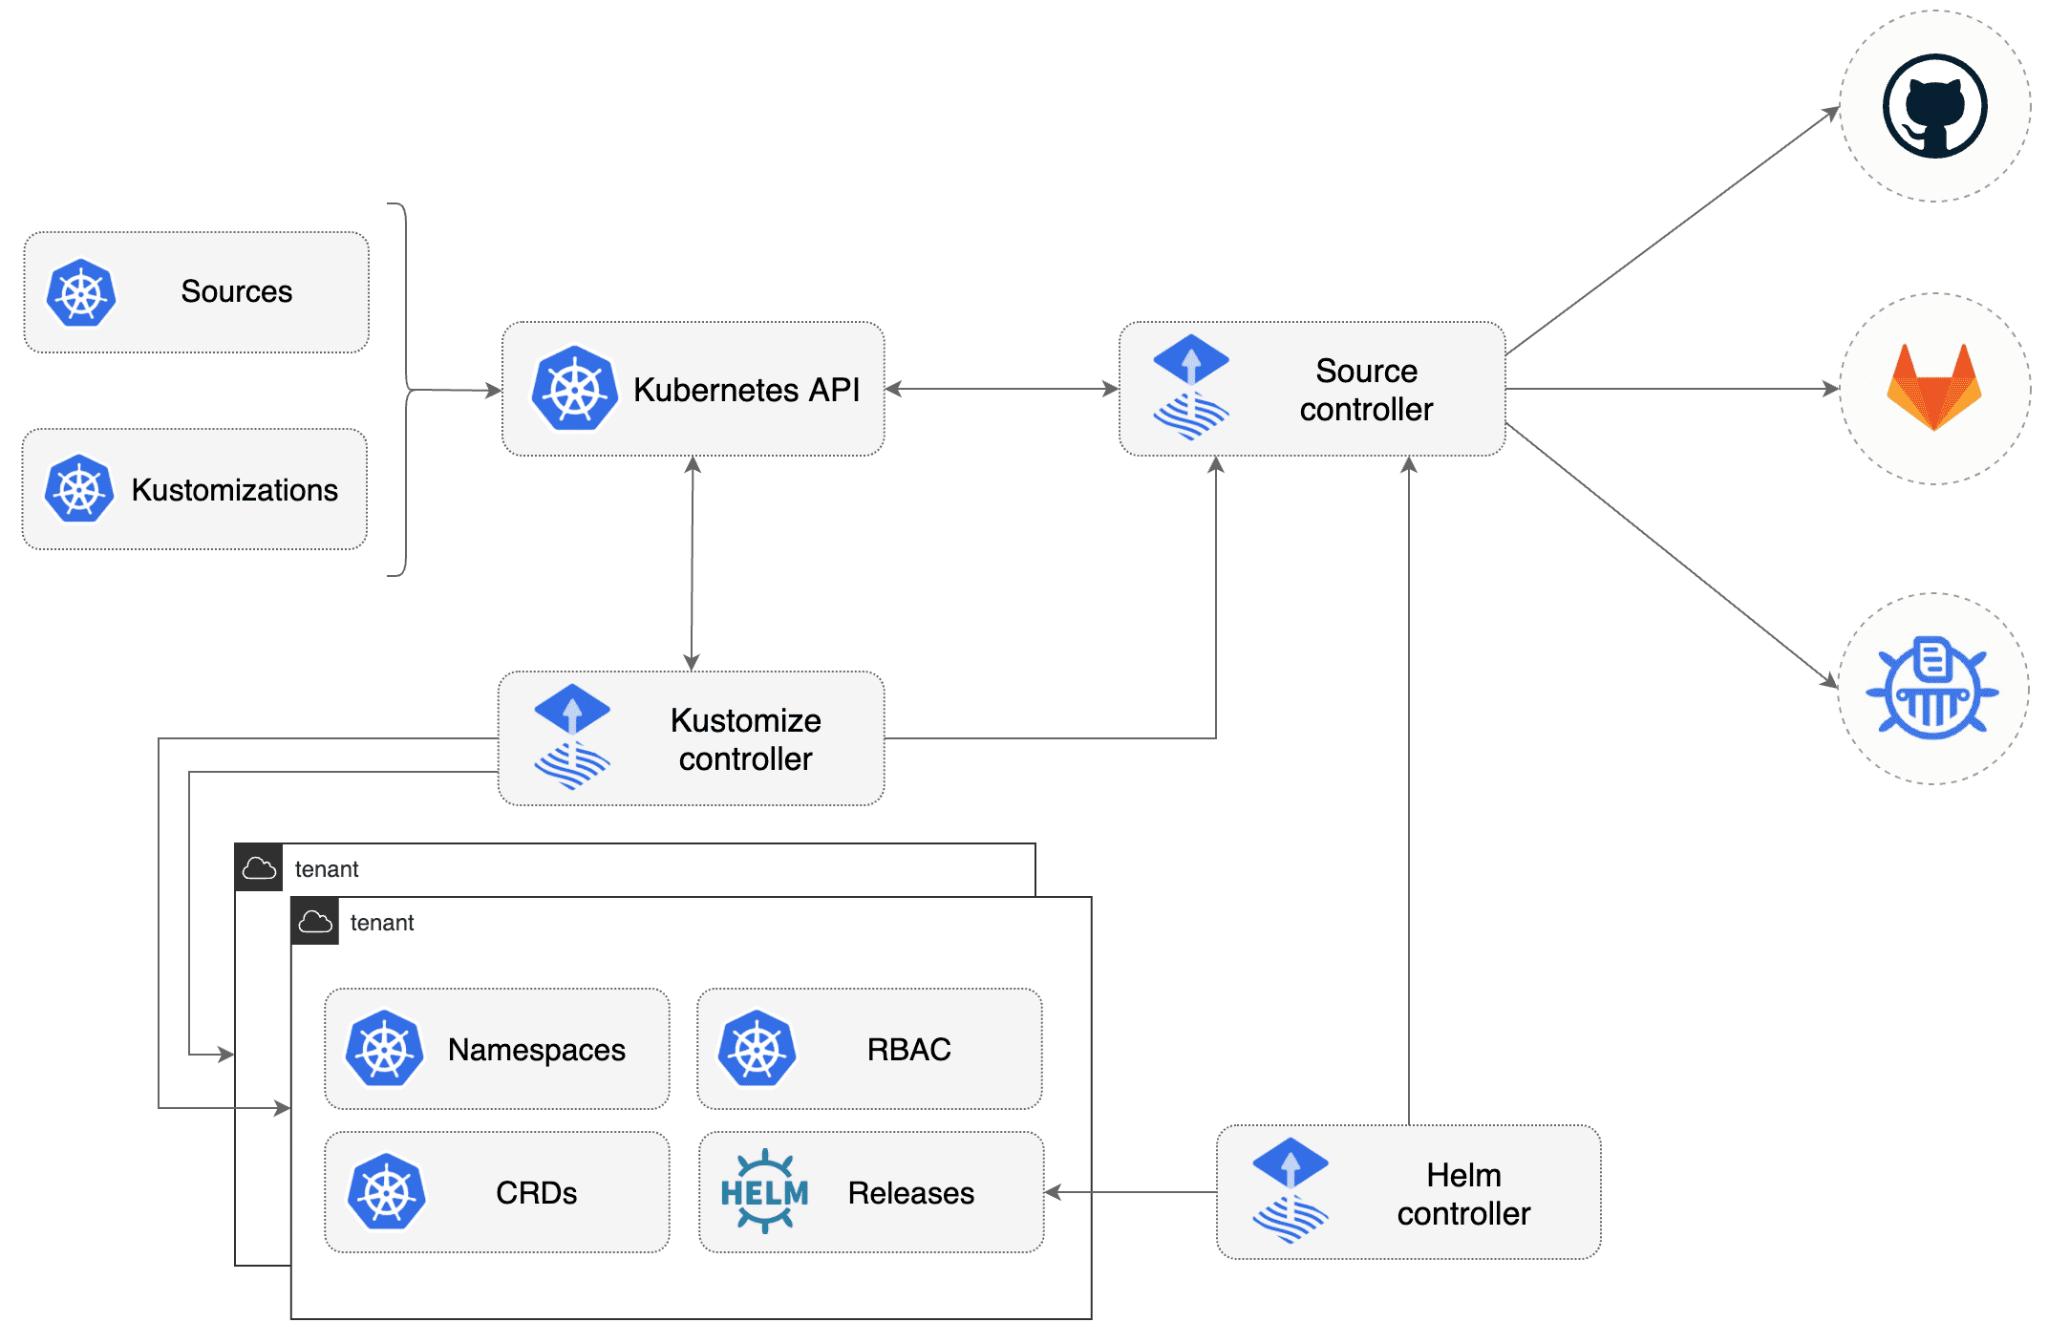 flux2 - Kubernetes Deployment Tools to Improve Your Devops